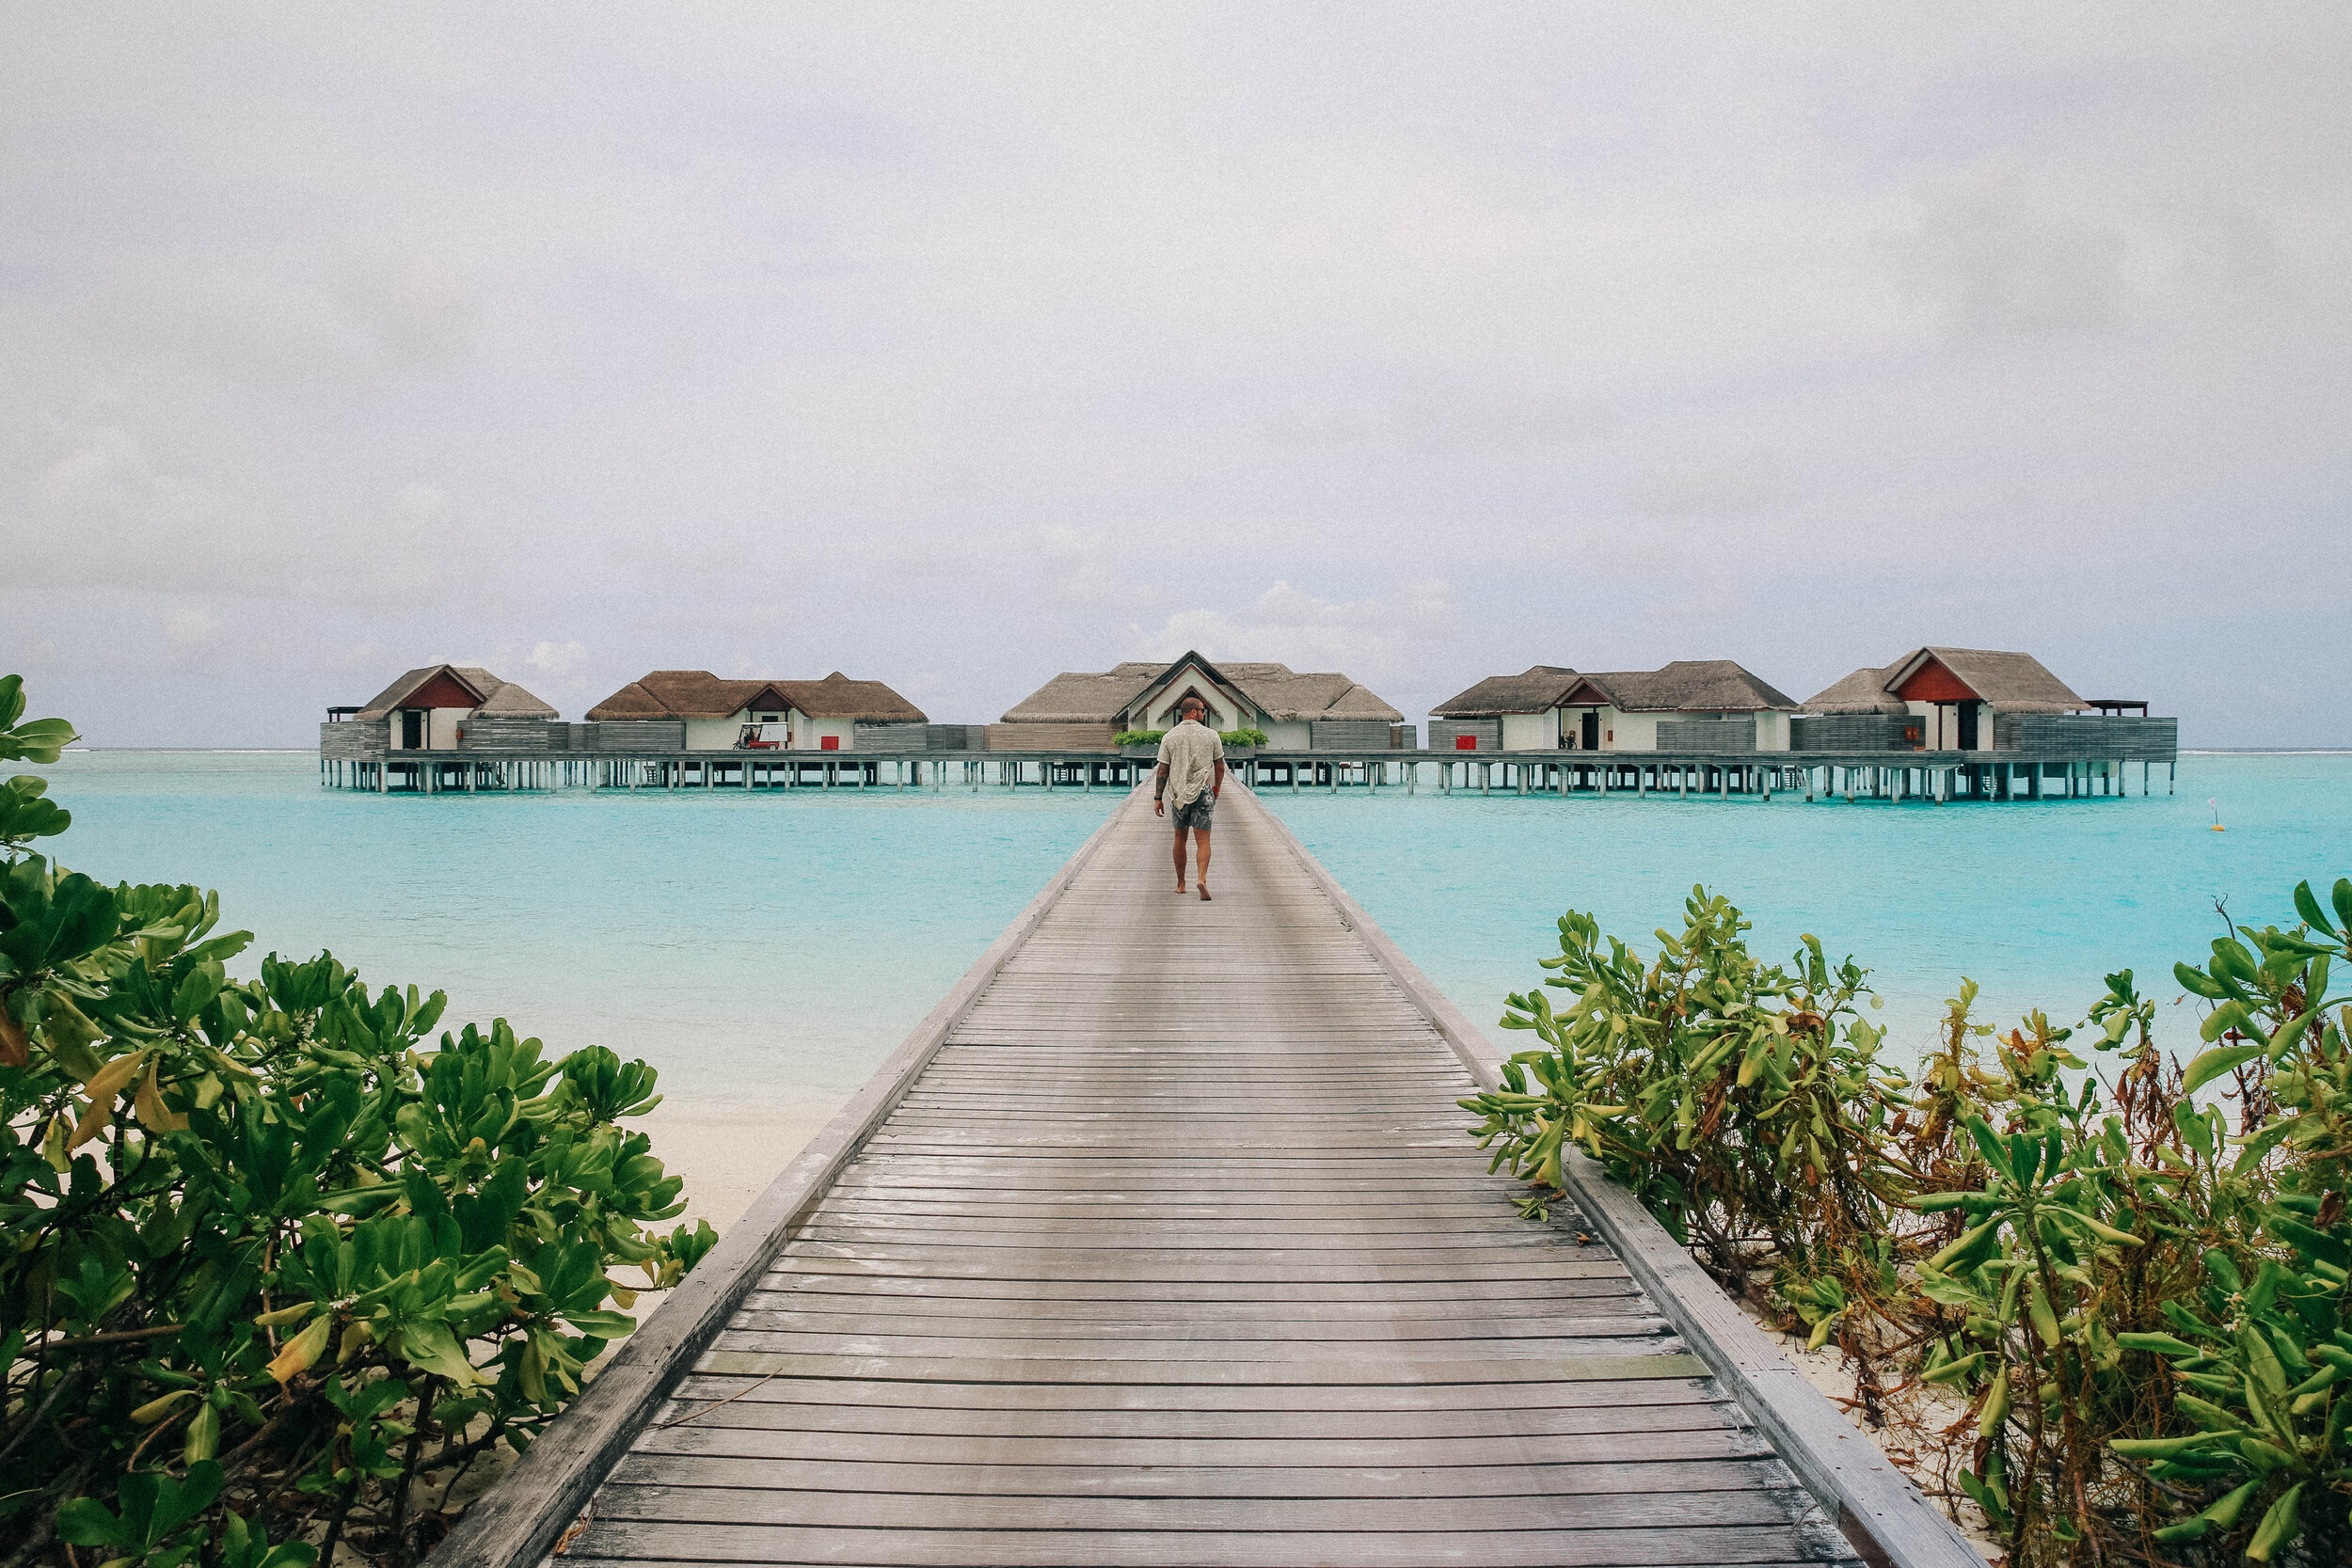 niyama maldives, stay active in maldives, get fit in maldives